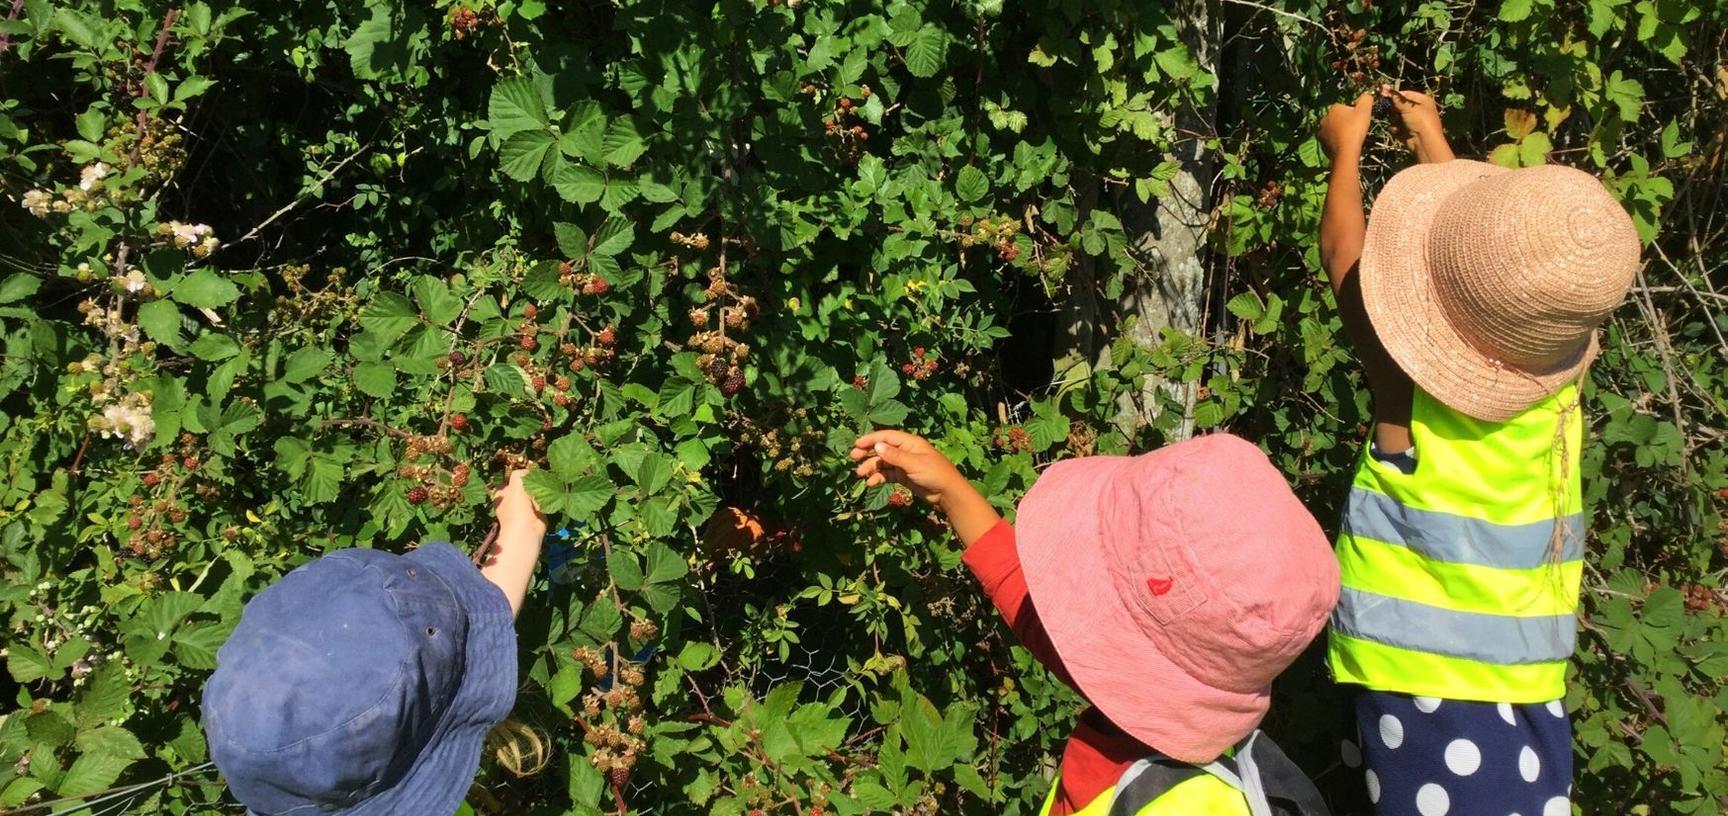 ey picking berries